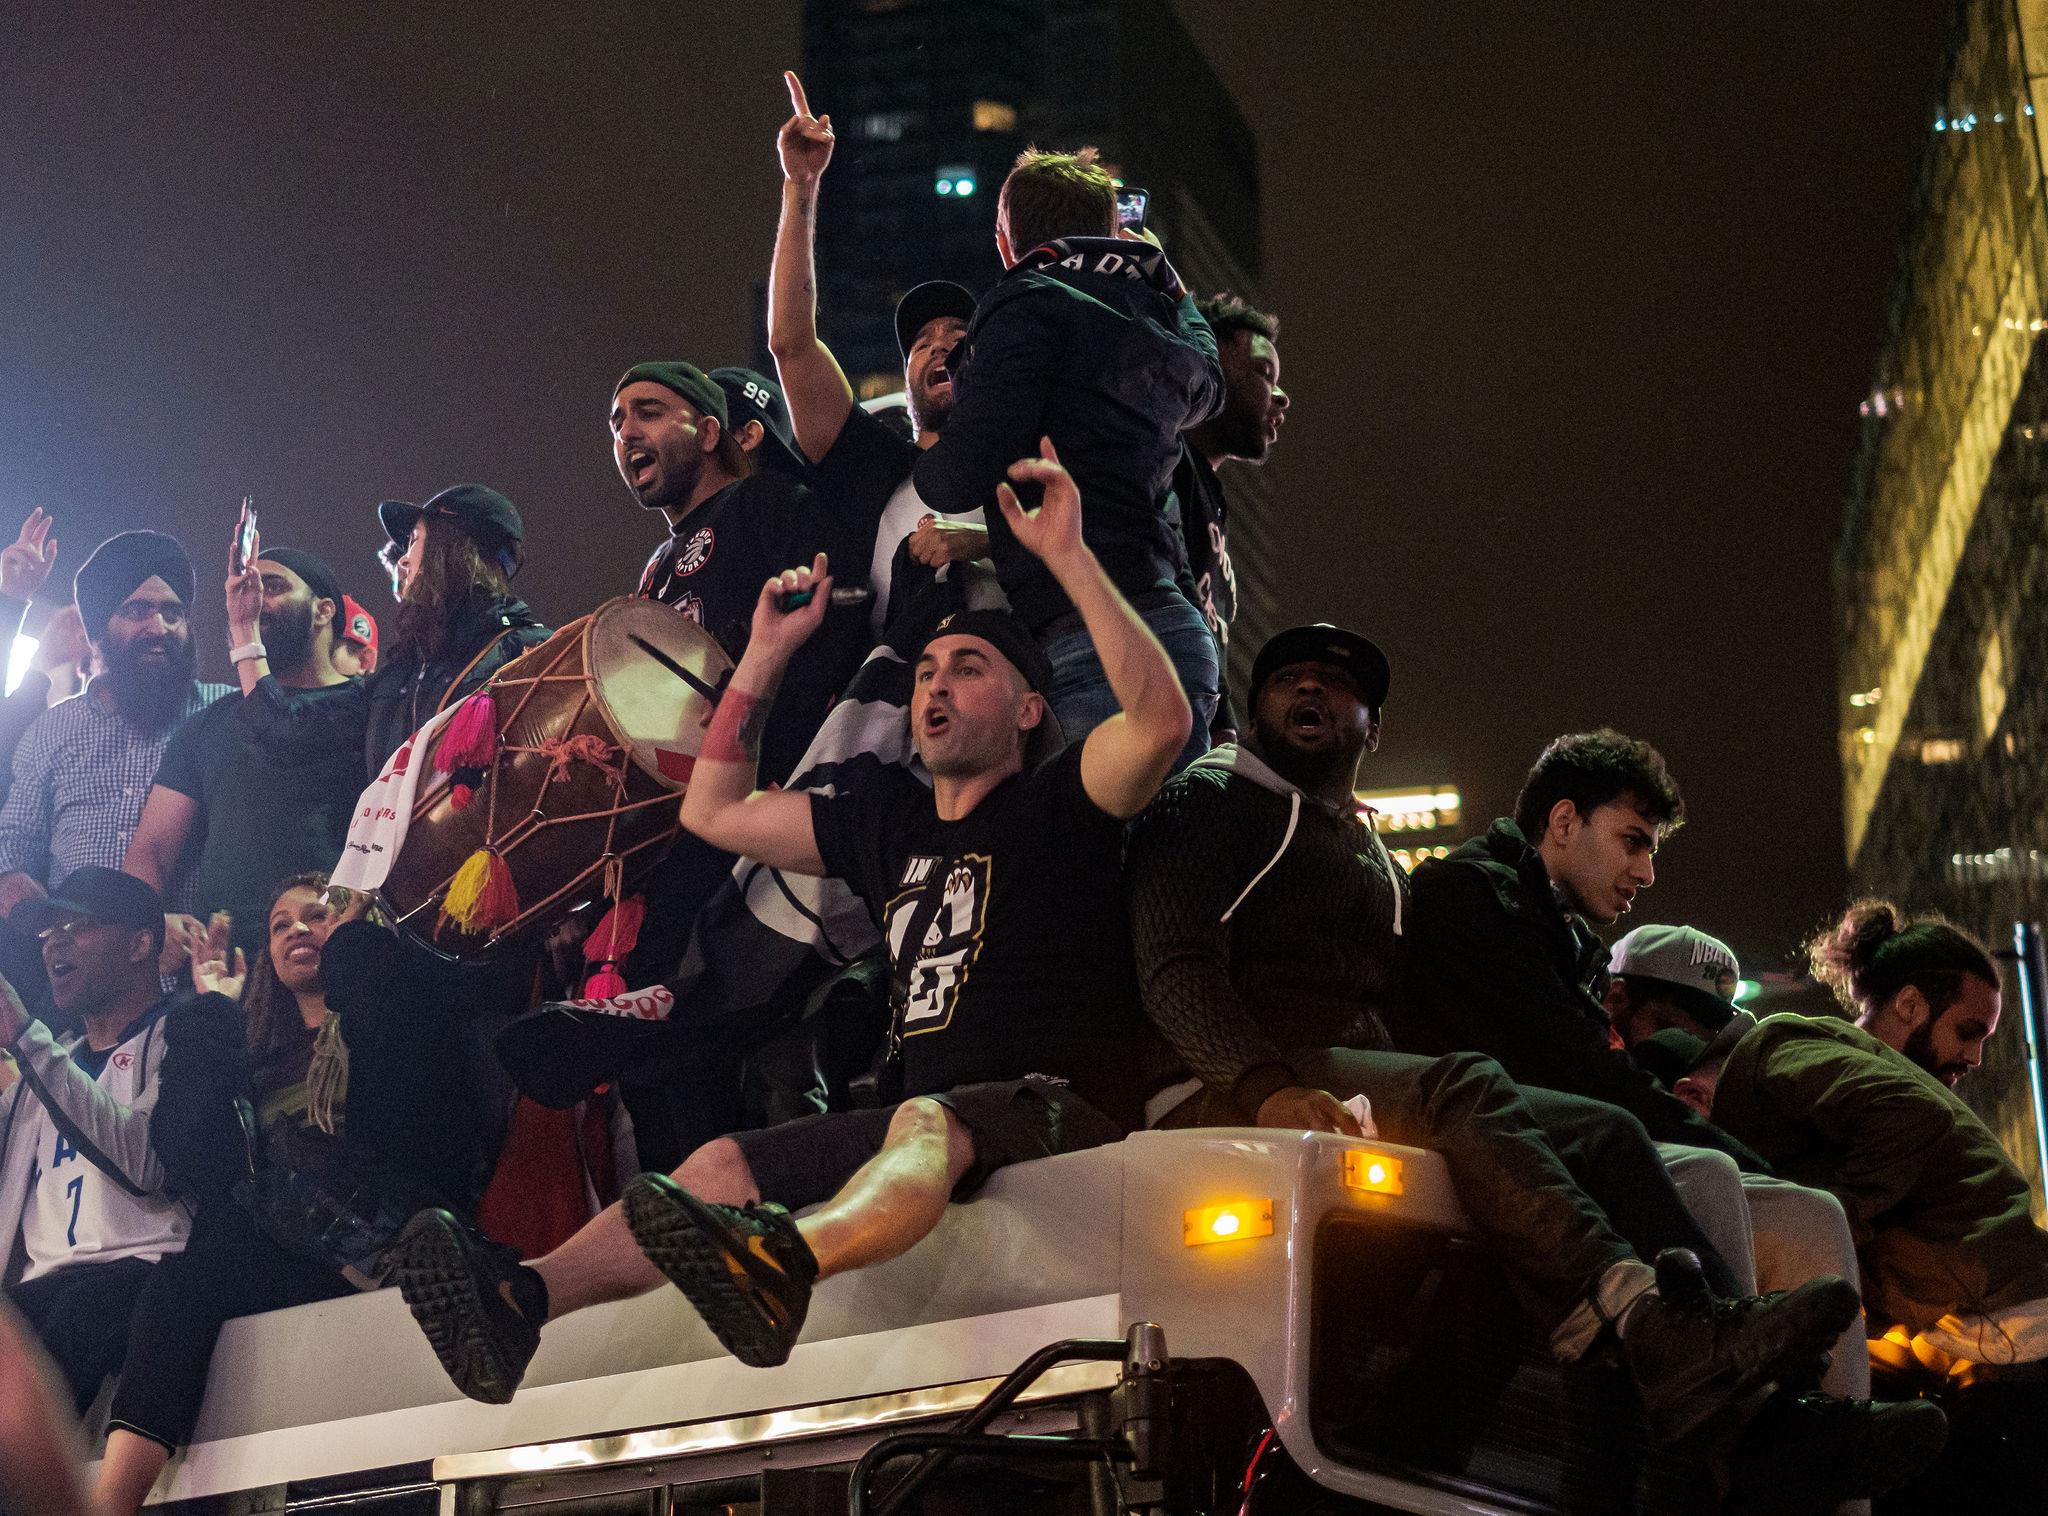 We_The_North_Raptors_NBA_Championship_Toronto_DSCF6390-Copy1.jpg